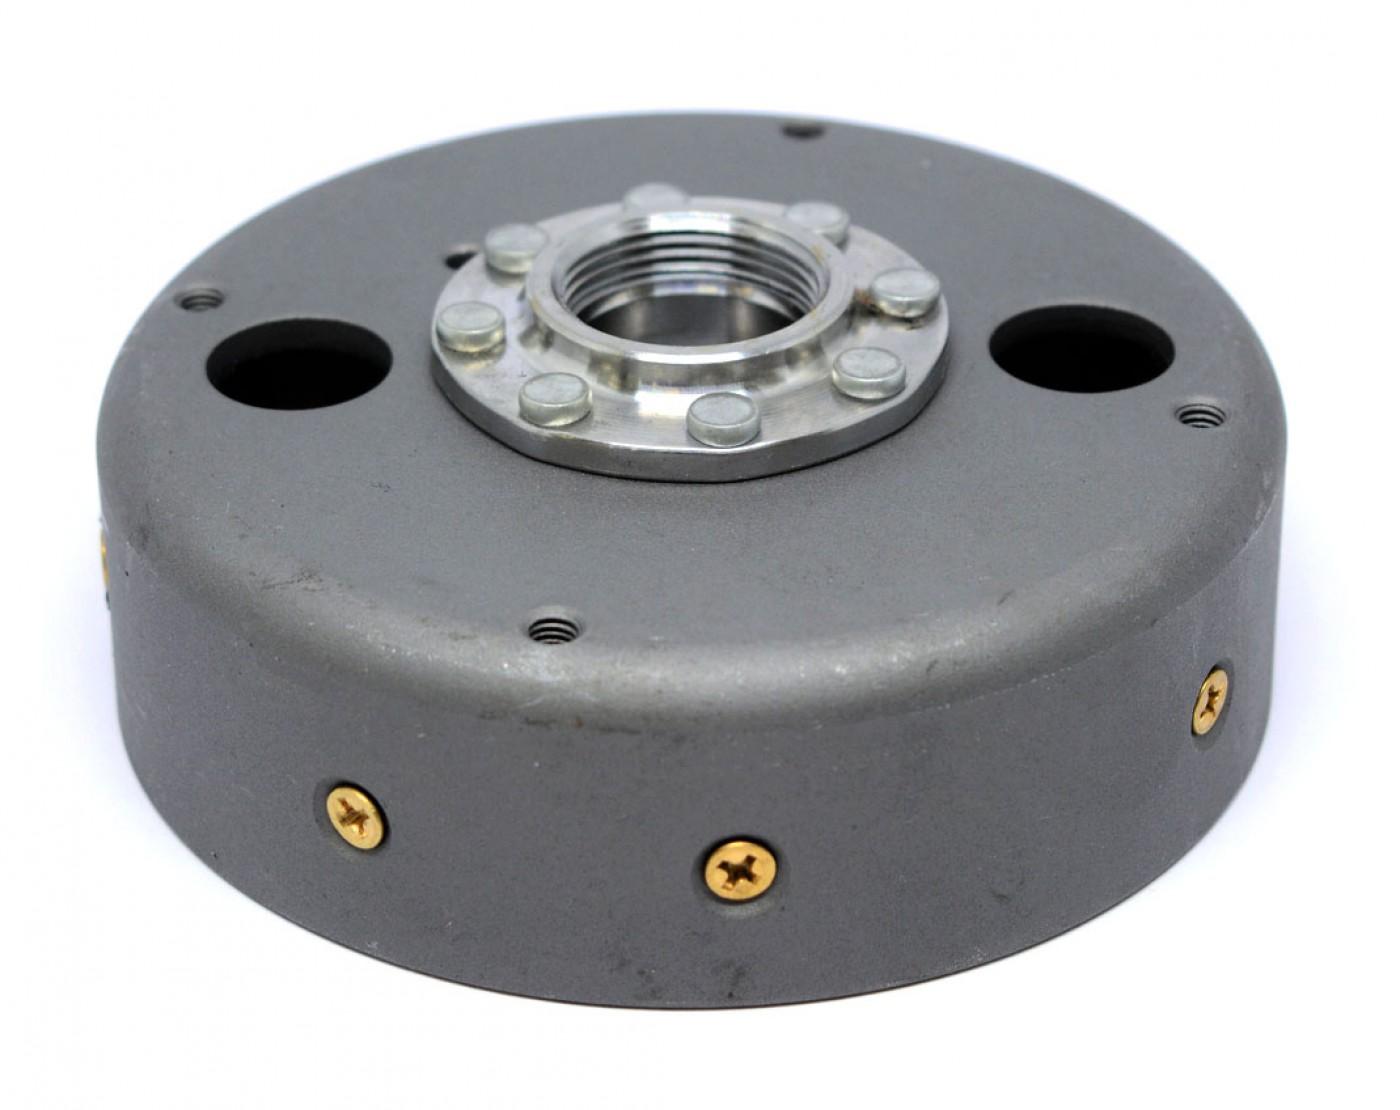 Rotor Stihl 070 090 090G MS720 (1106 400 1206)